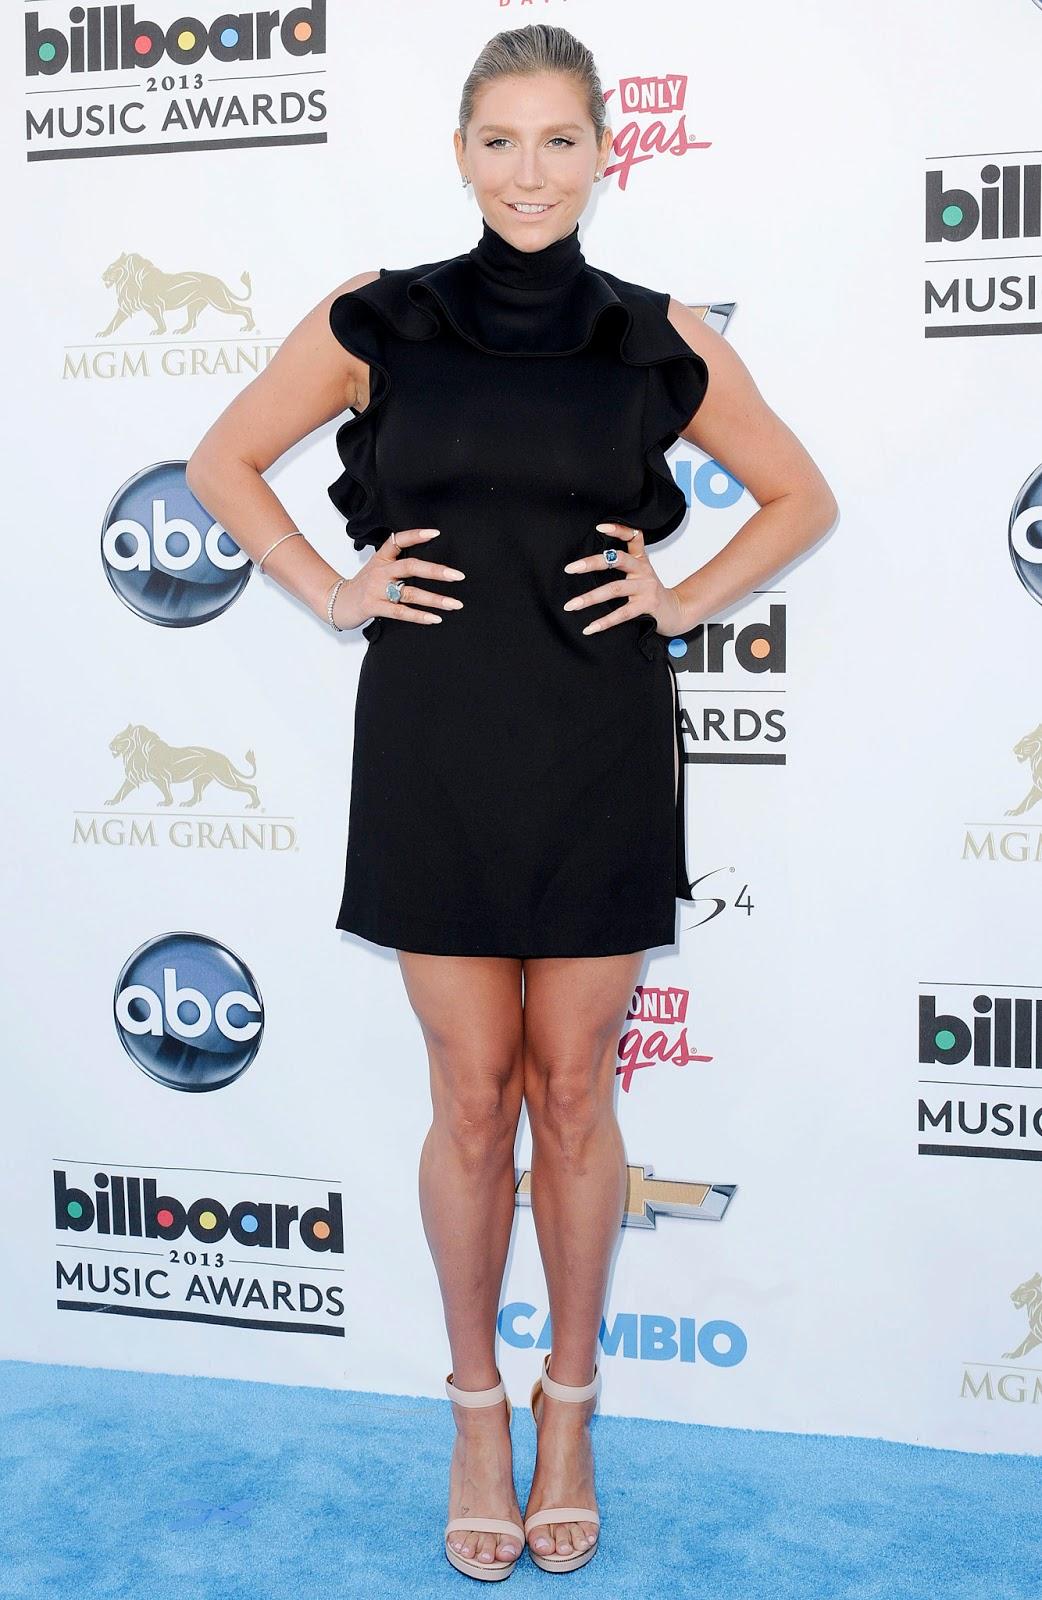 Billboard Music Awards 2016 The Best Hair And Makeup: Kesha - 2013 Billboard Music Awards